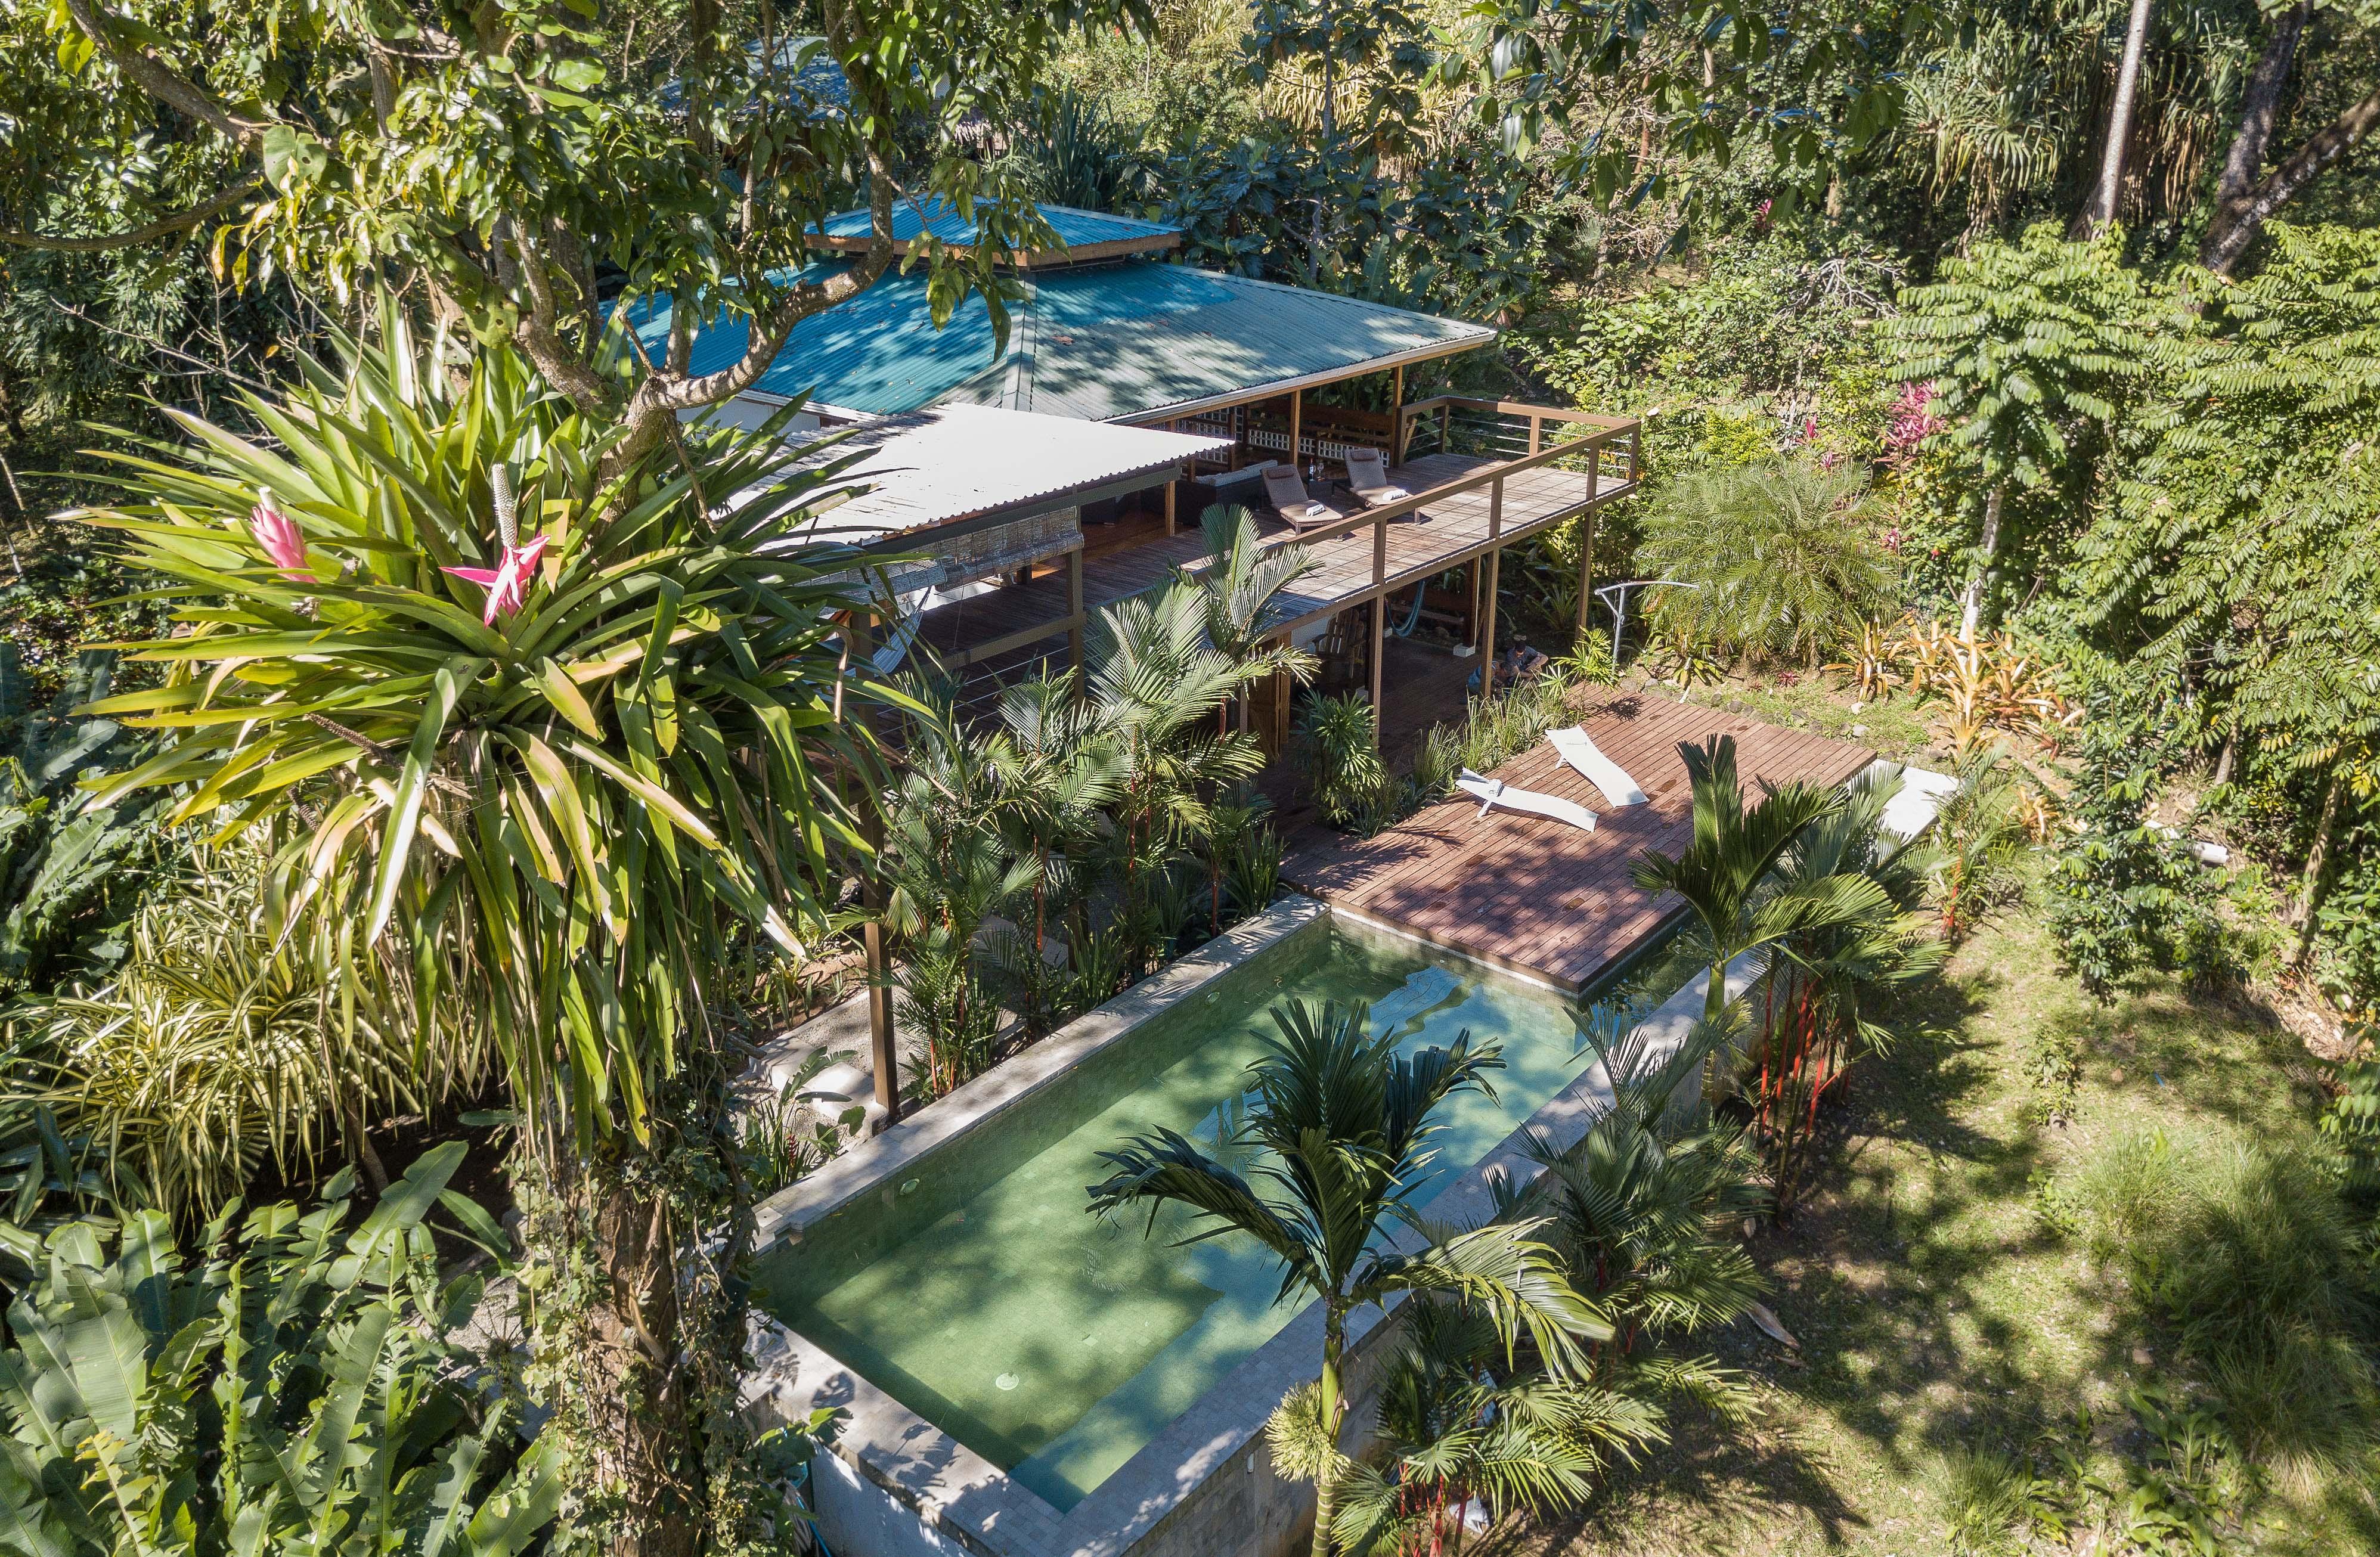 CASITA TUCAN / MONKEY HOUSE